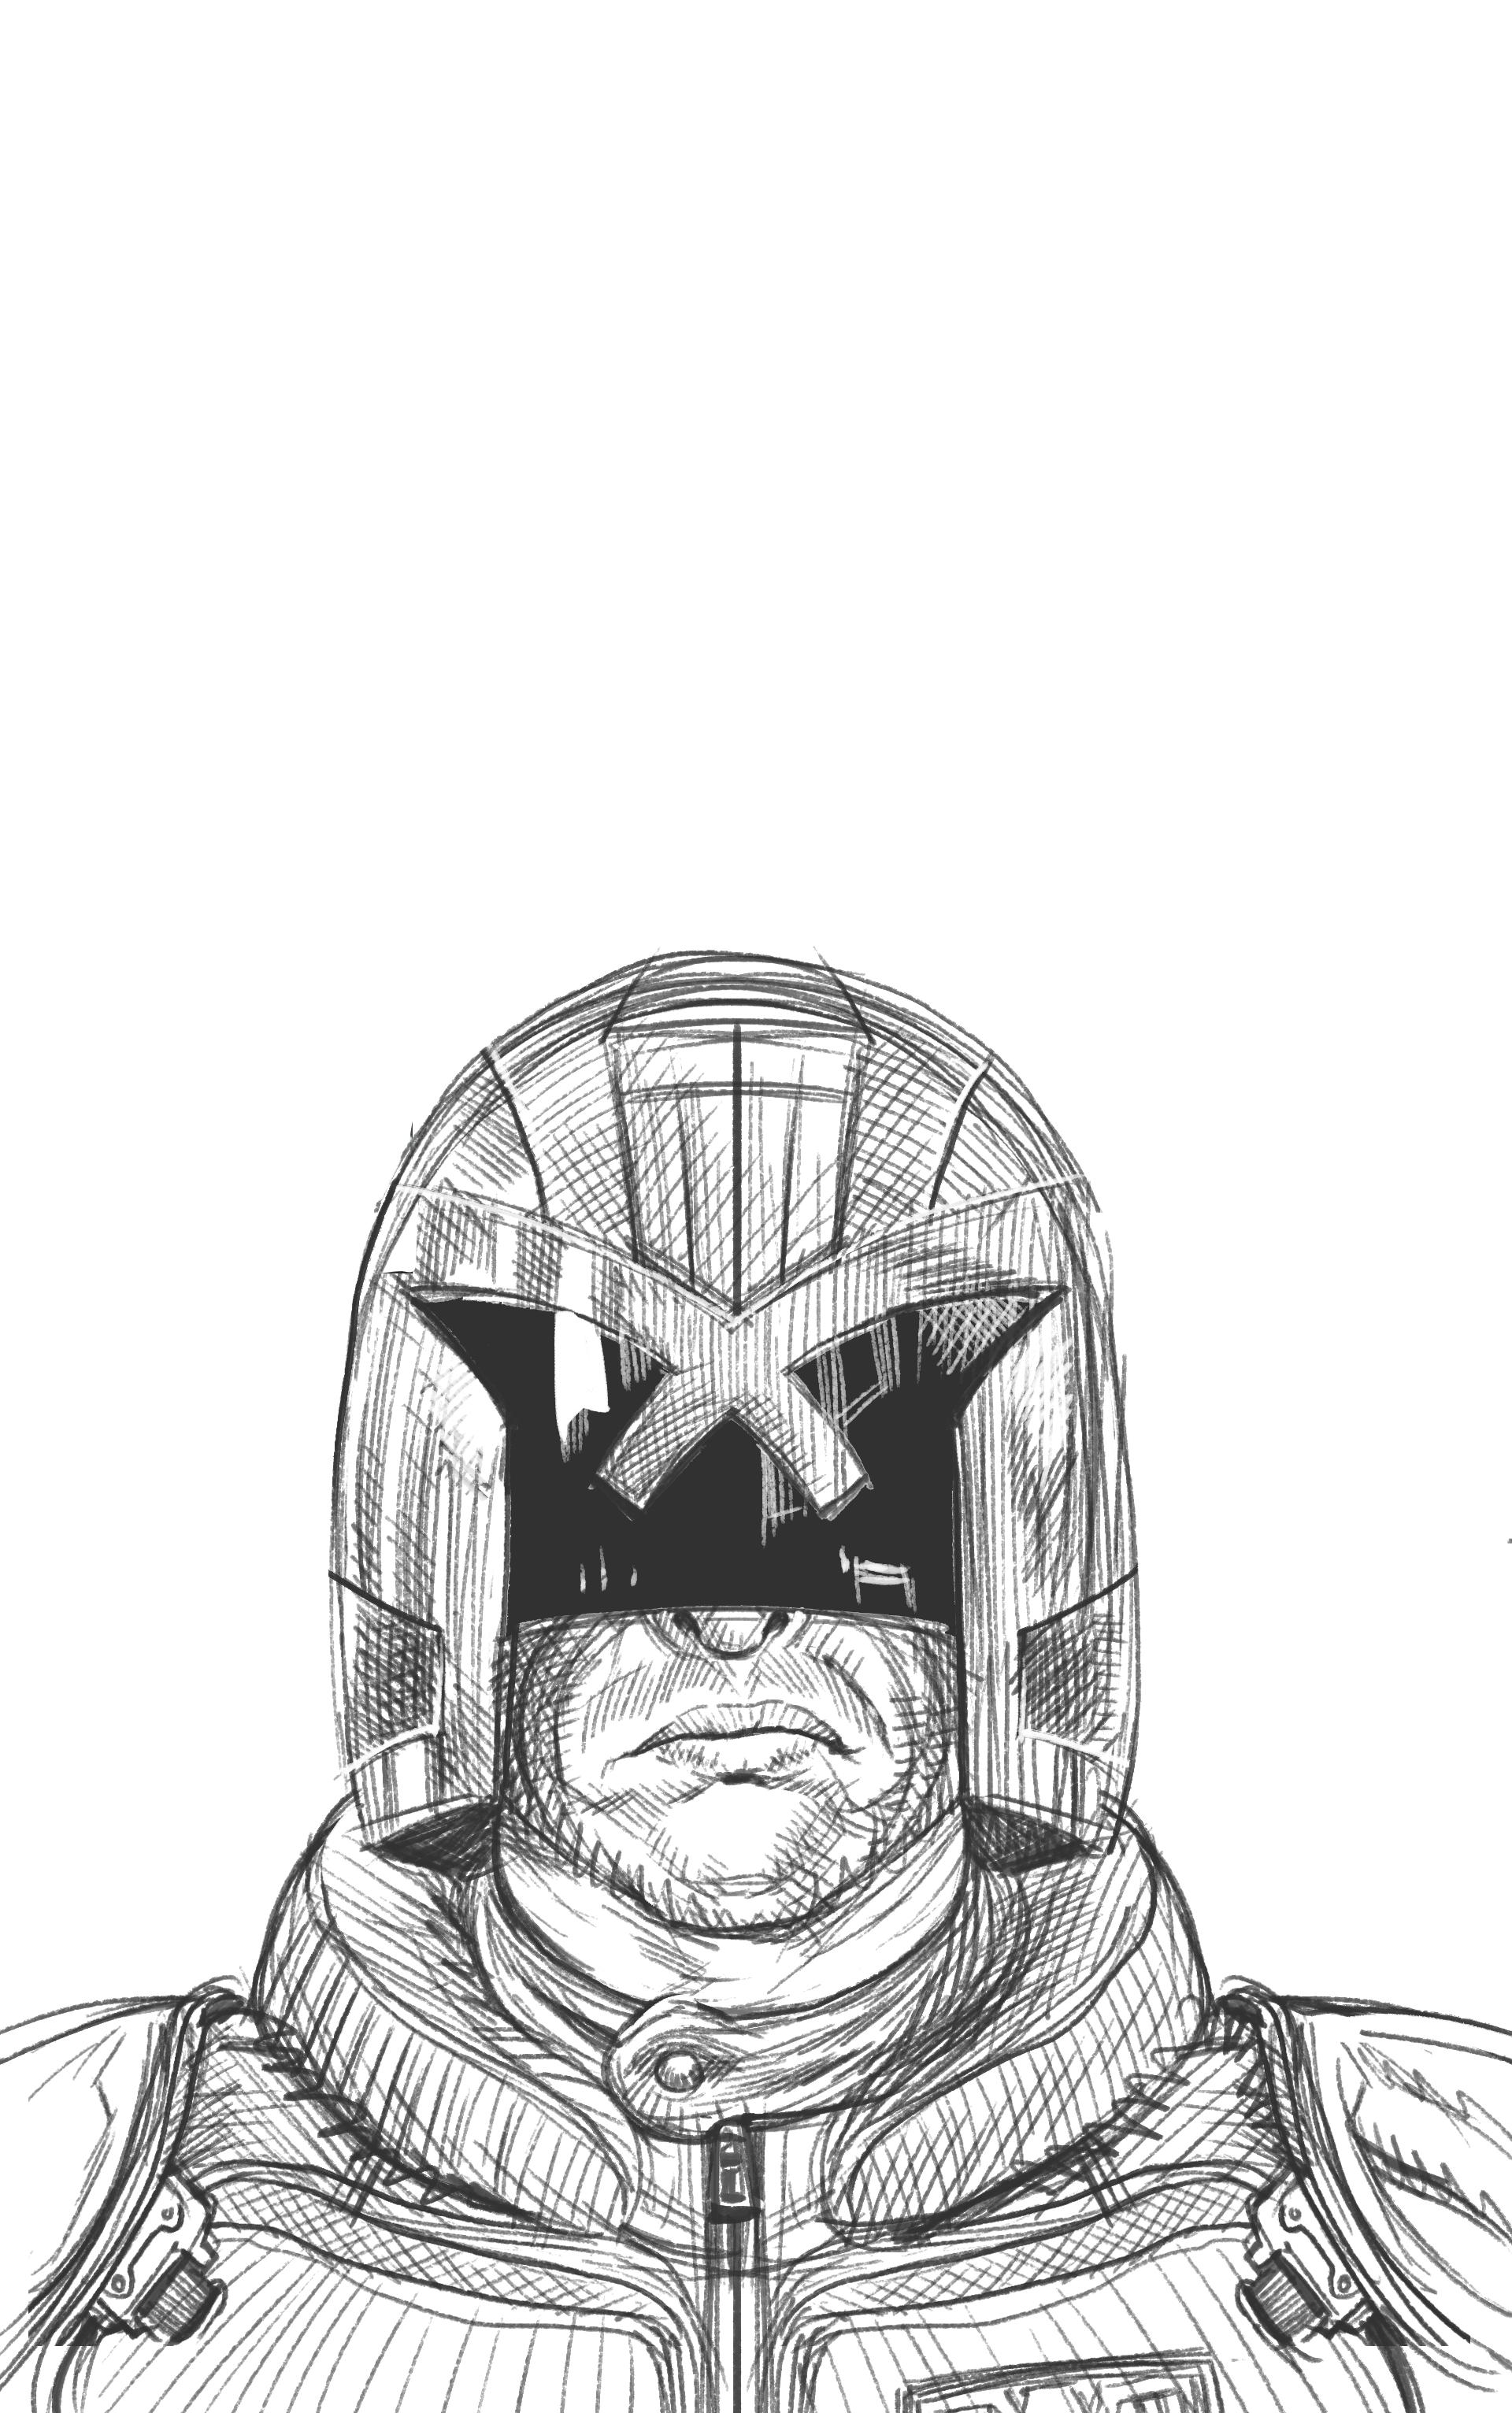 Dredd-Portrait-vertical.png